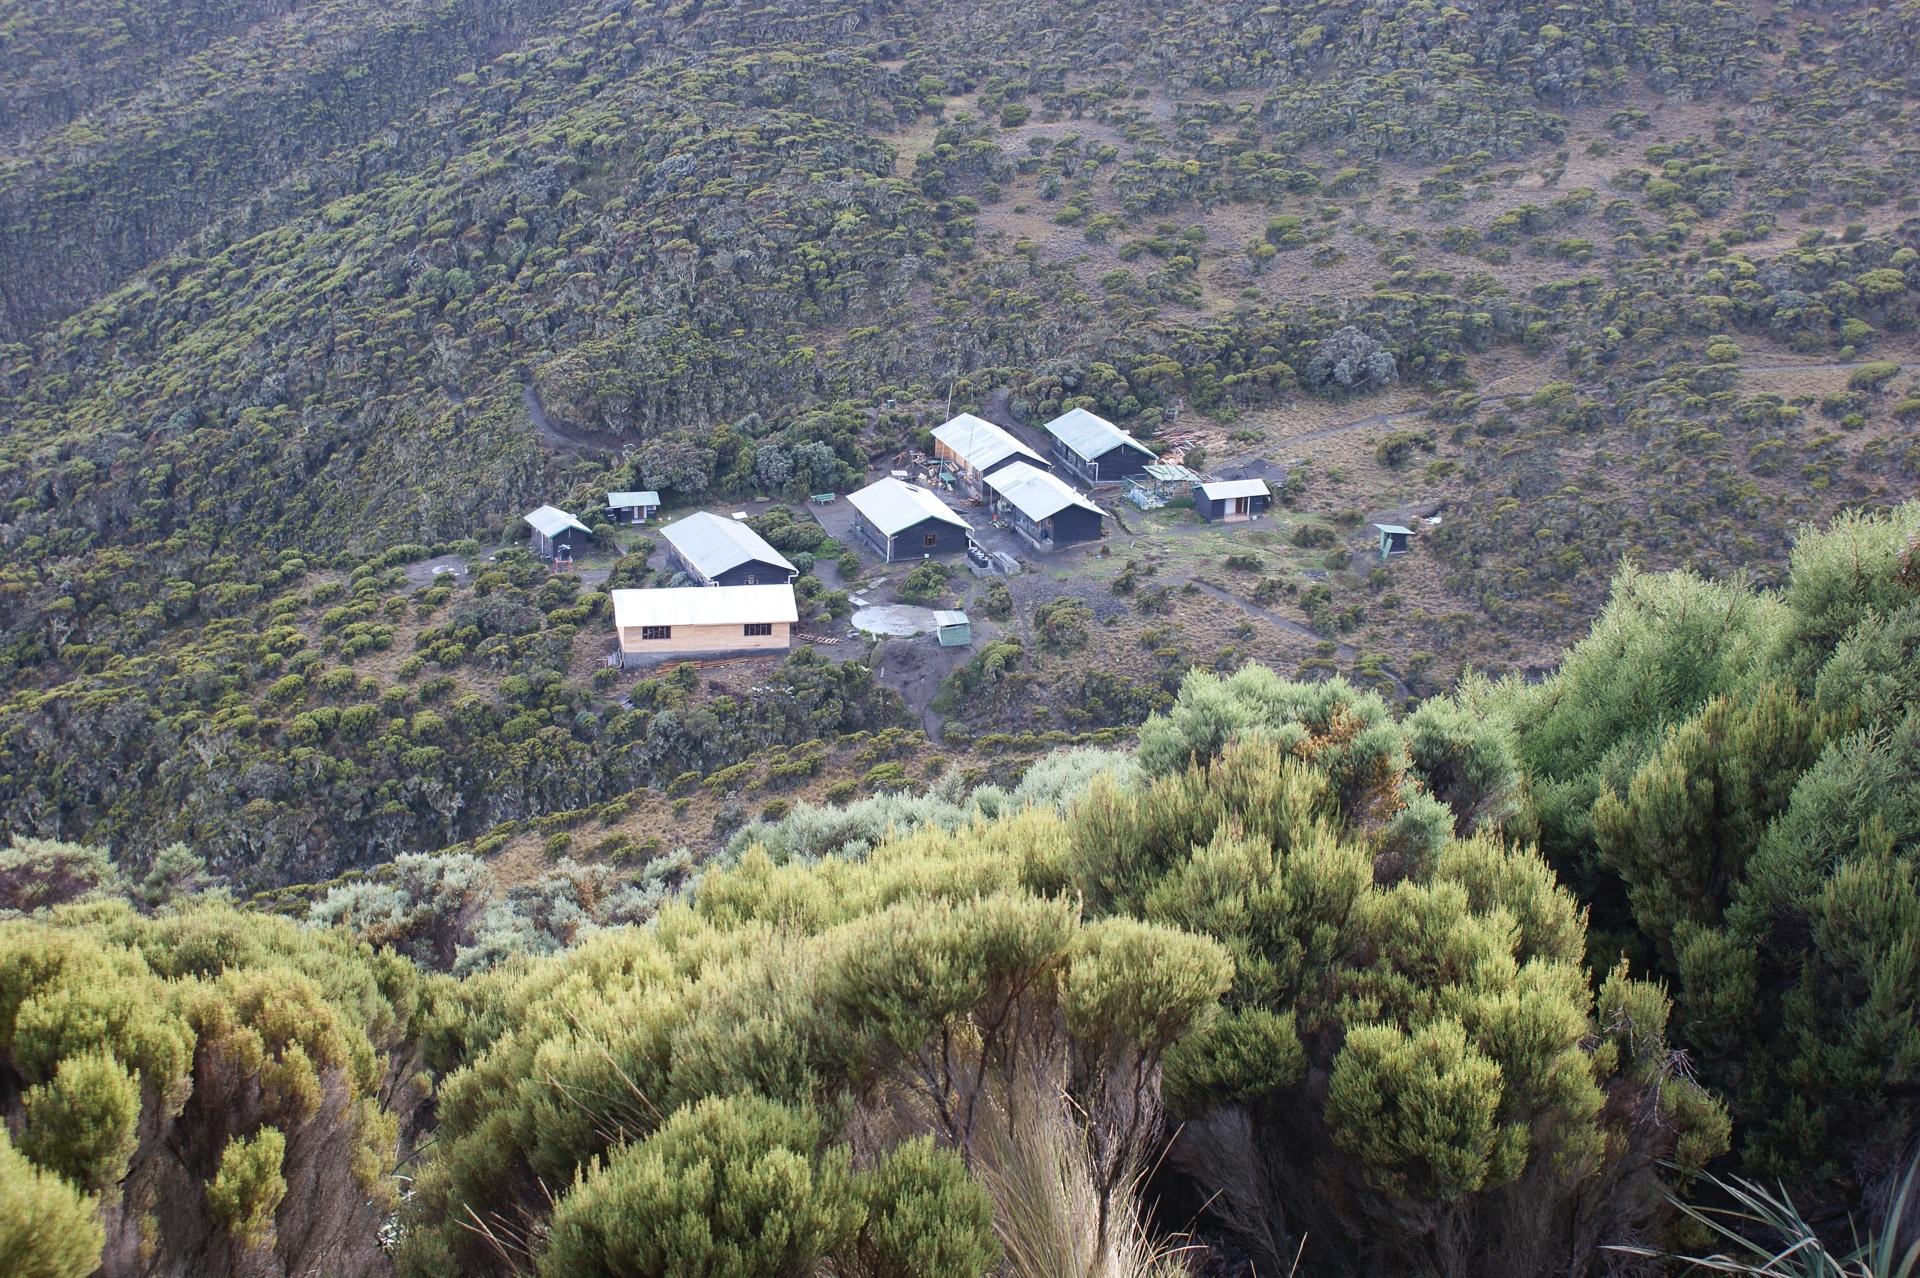 Kilimanjaro-Tansania-Globetrotter-Select-Krause4